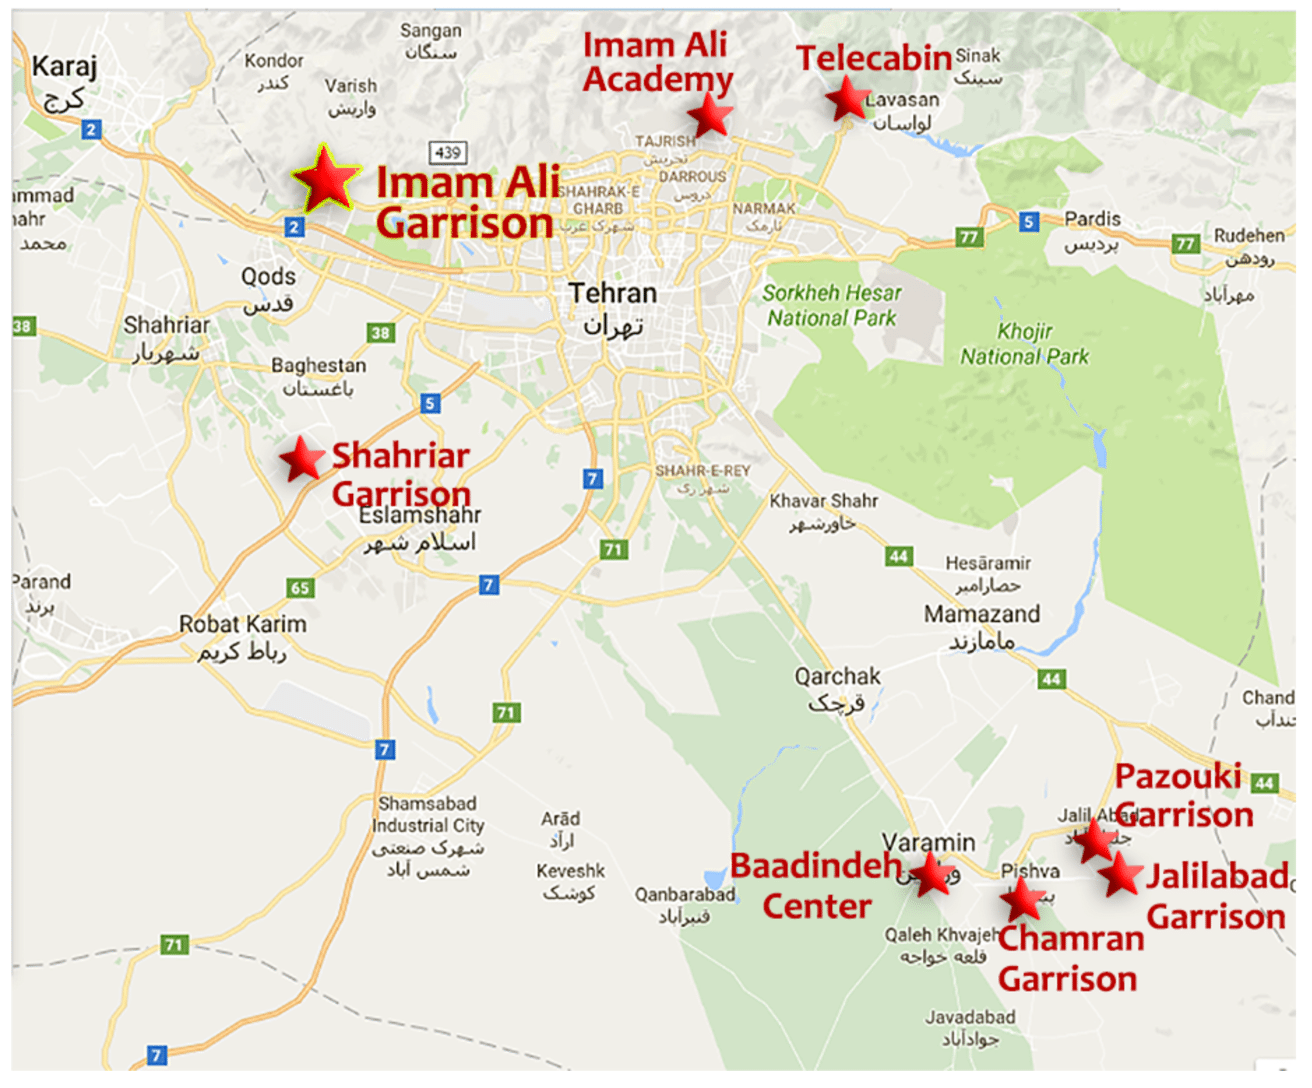 location of 8 irgc terrorist training camps in tehran